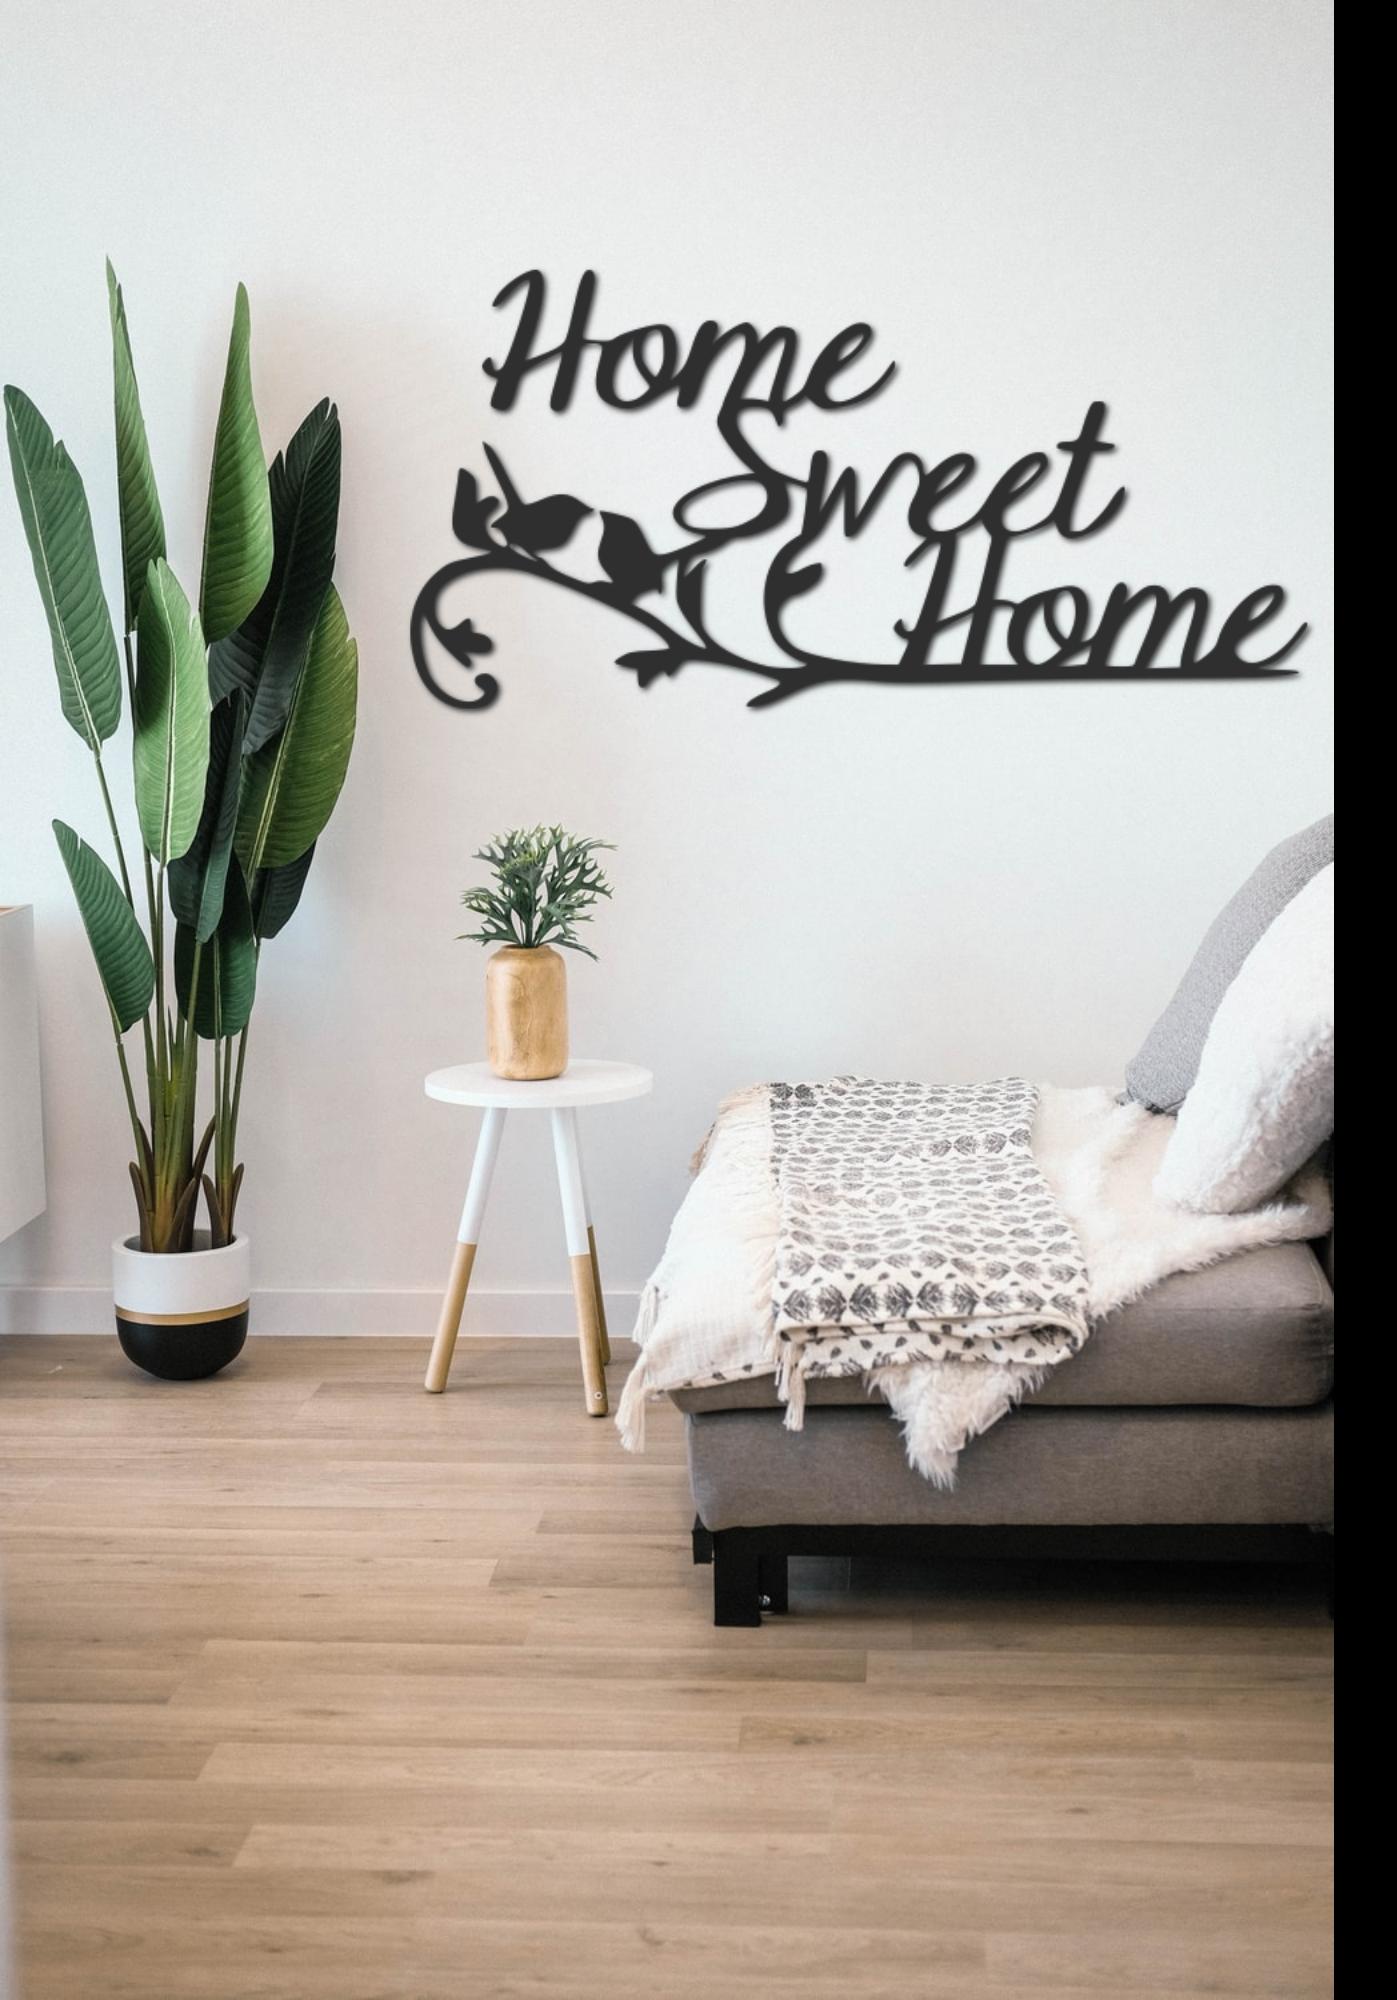 Déco murale Home sweet home